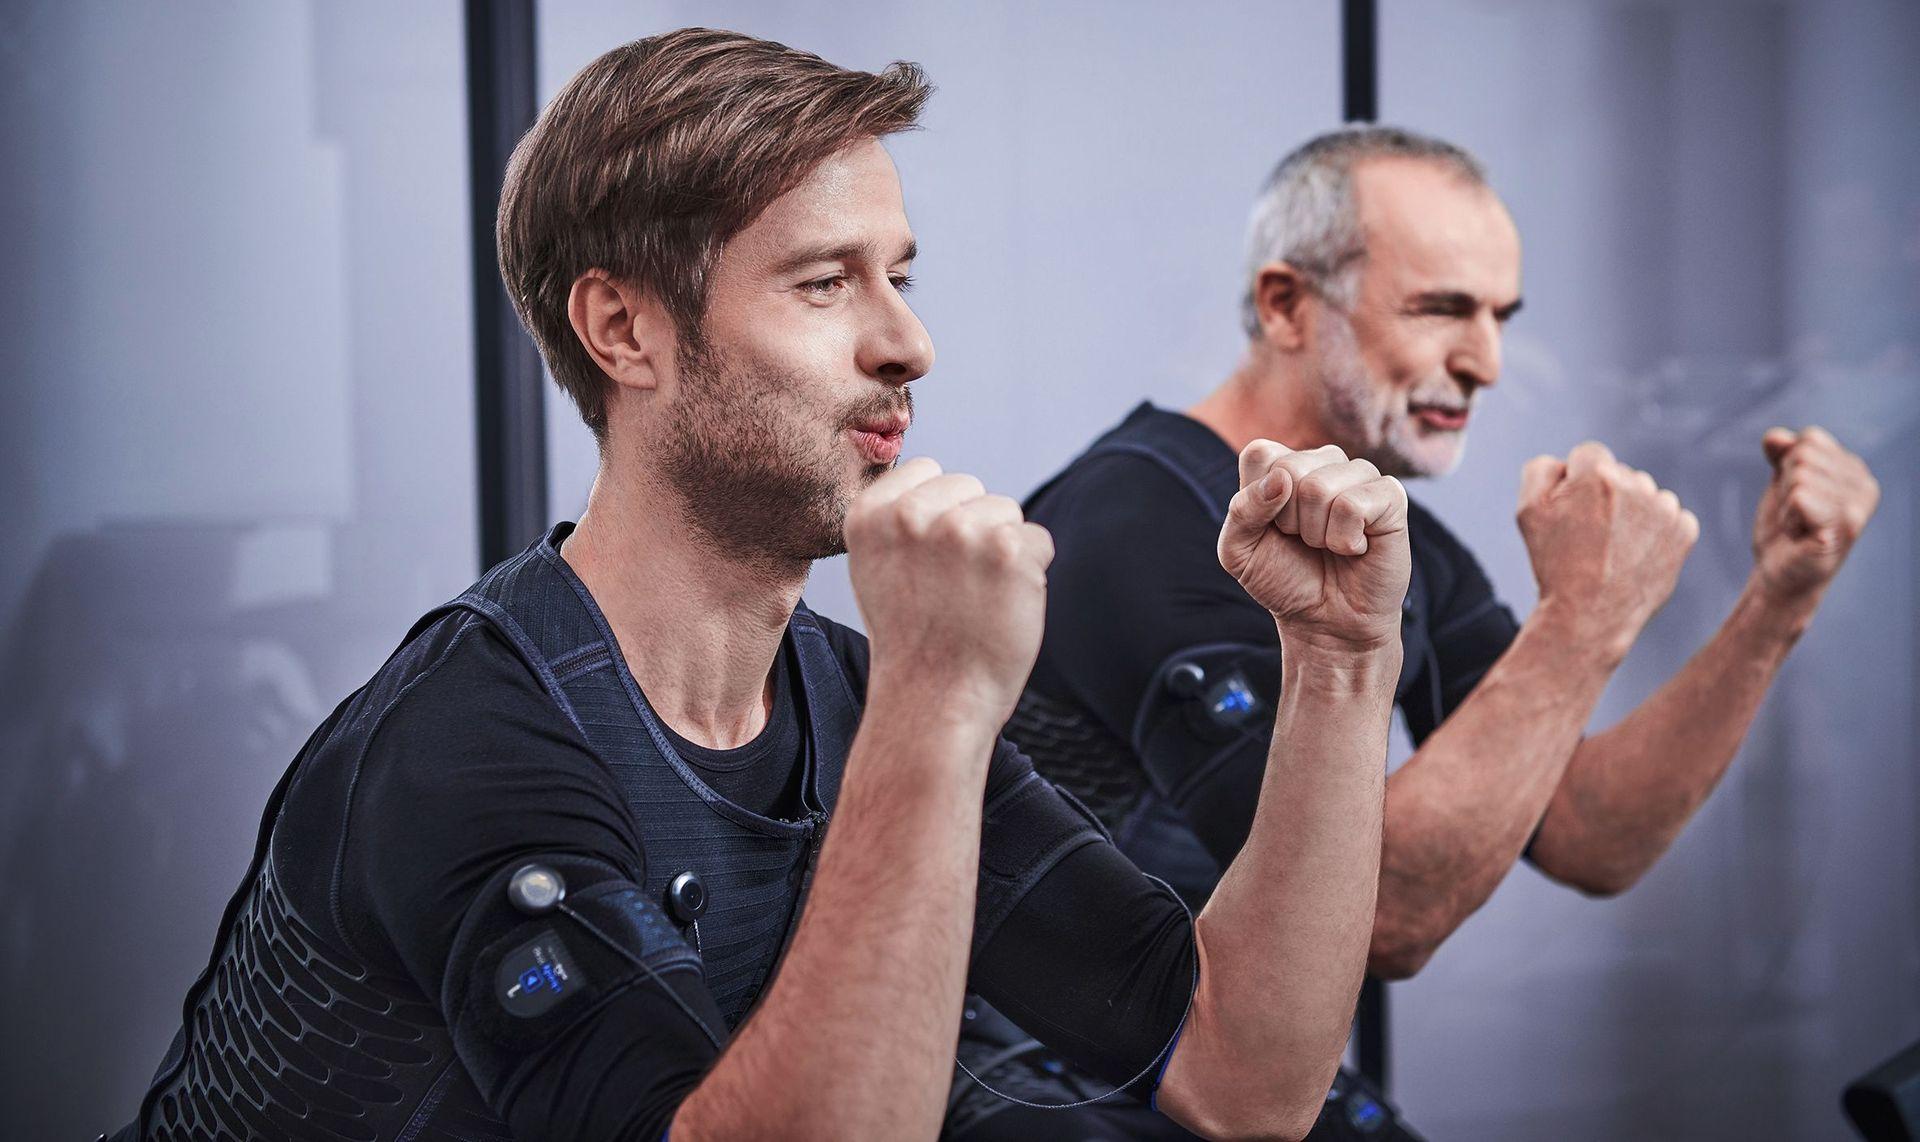 EMS Training | FÜHLBAR fit - DAS GESUNDHEITSSTUDIO